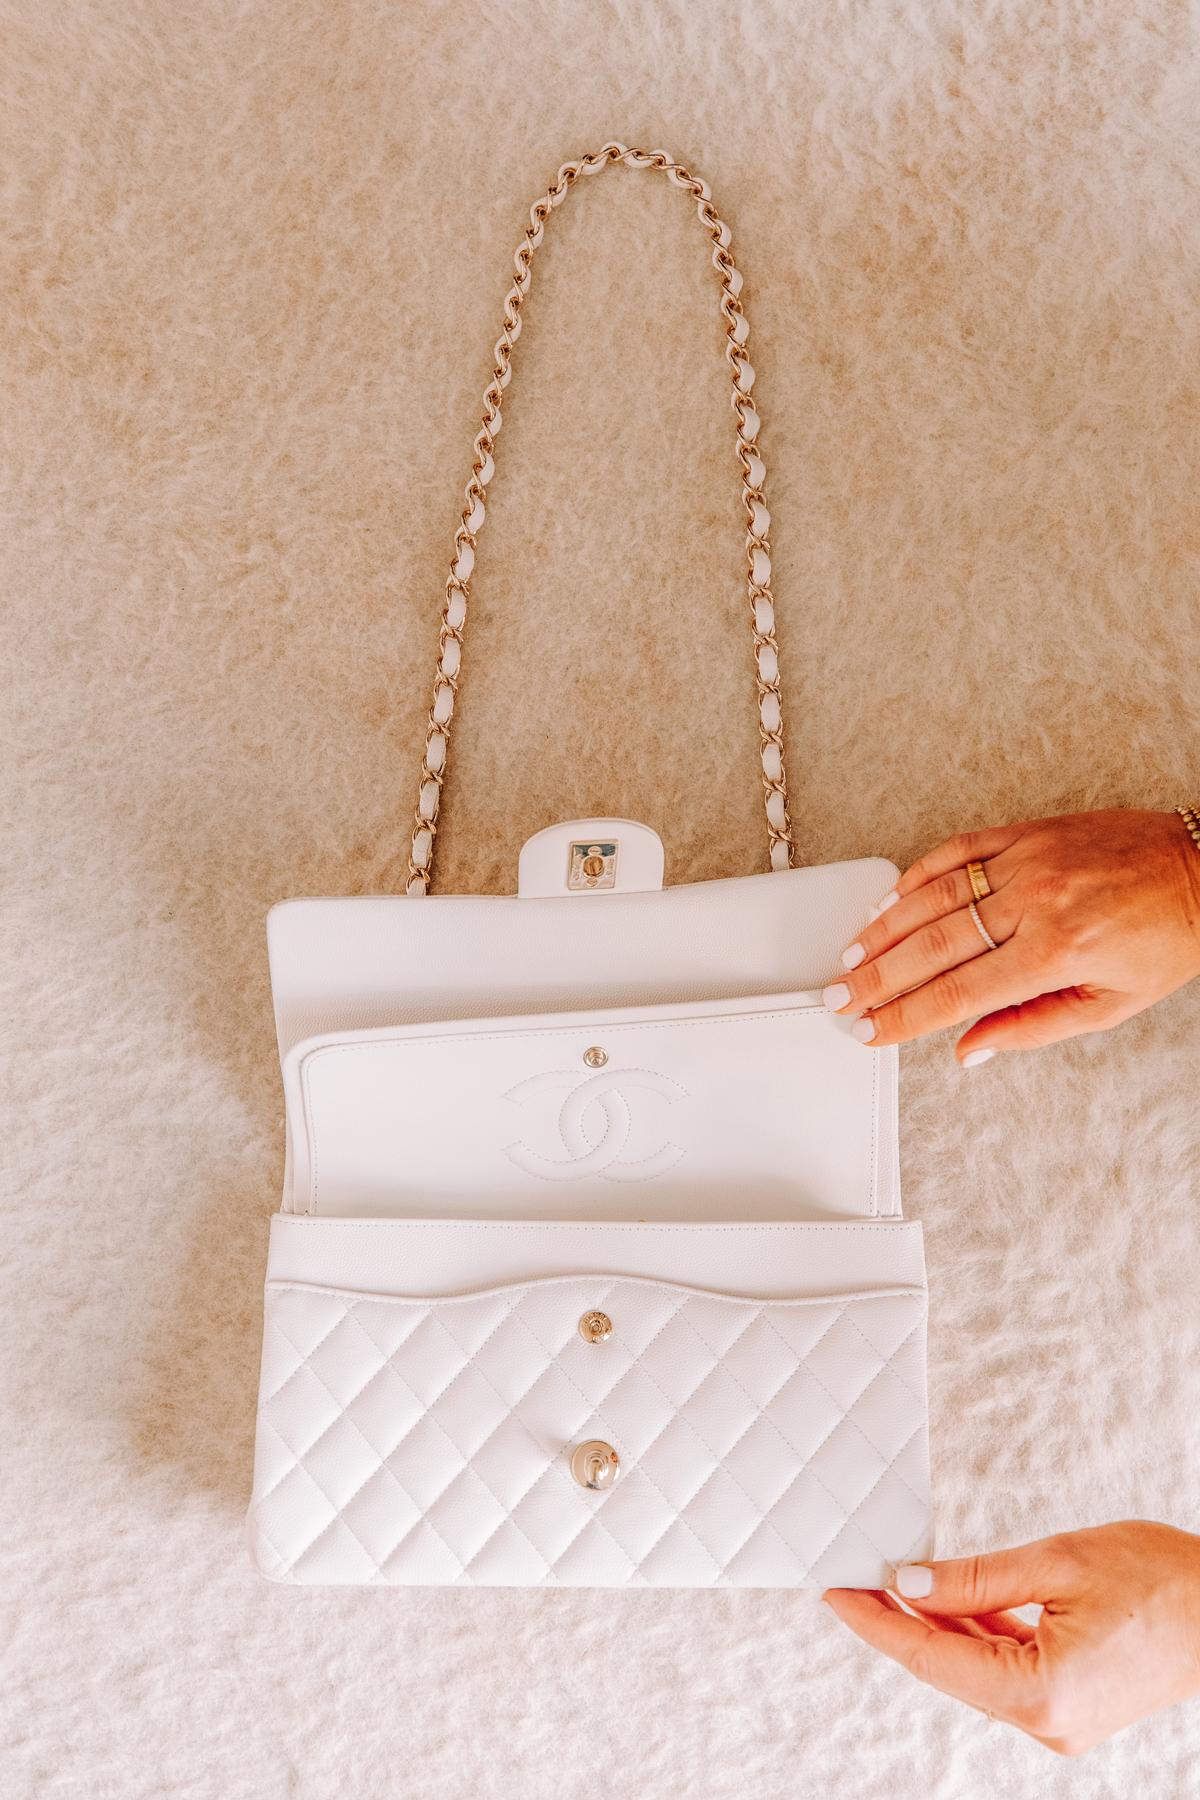 Fashion Jackson Chanel Classic Flap Medium White Handbag with Gold Hardware 1